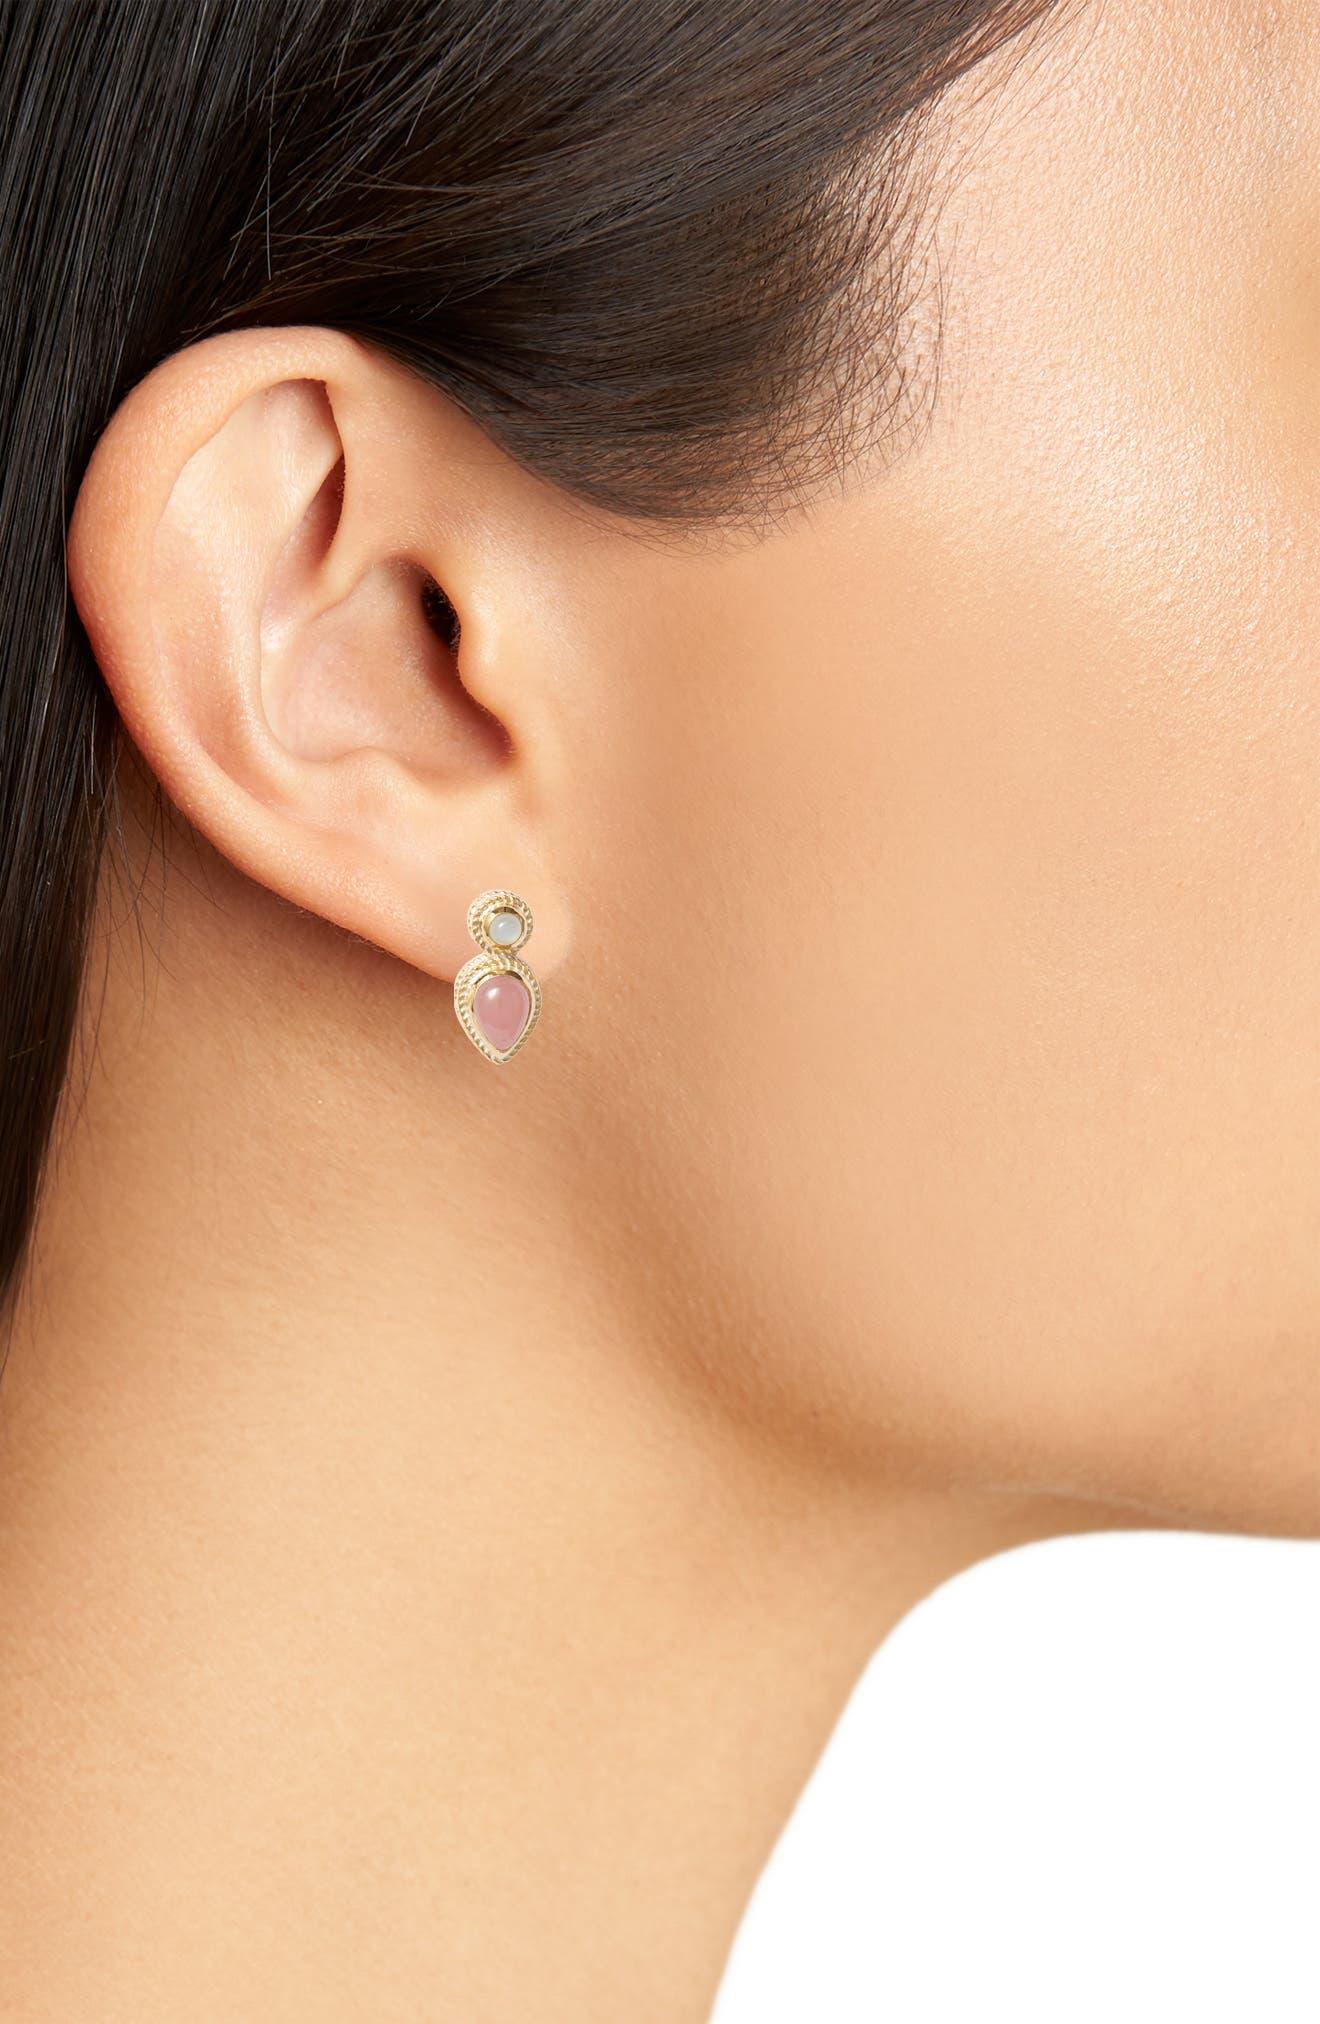 Guava Quartz & Moonstone Stud Earrings,                             Alternate thumbnail 2, color,                             Gold/ Guava/ Moonstone